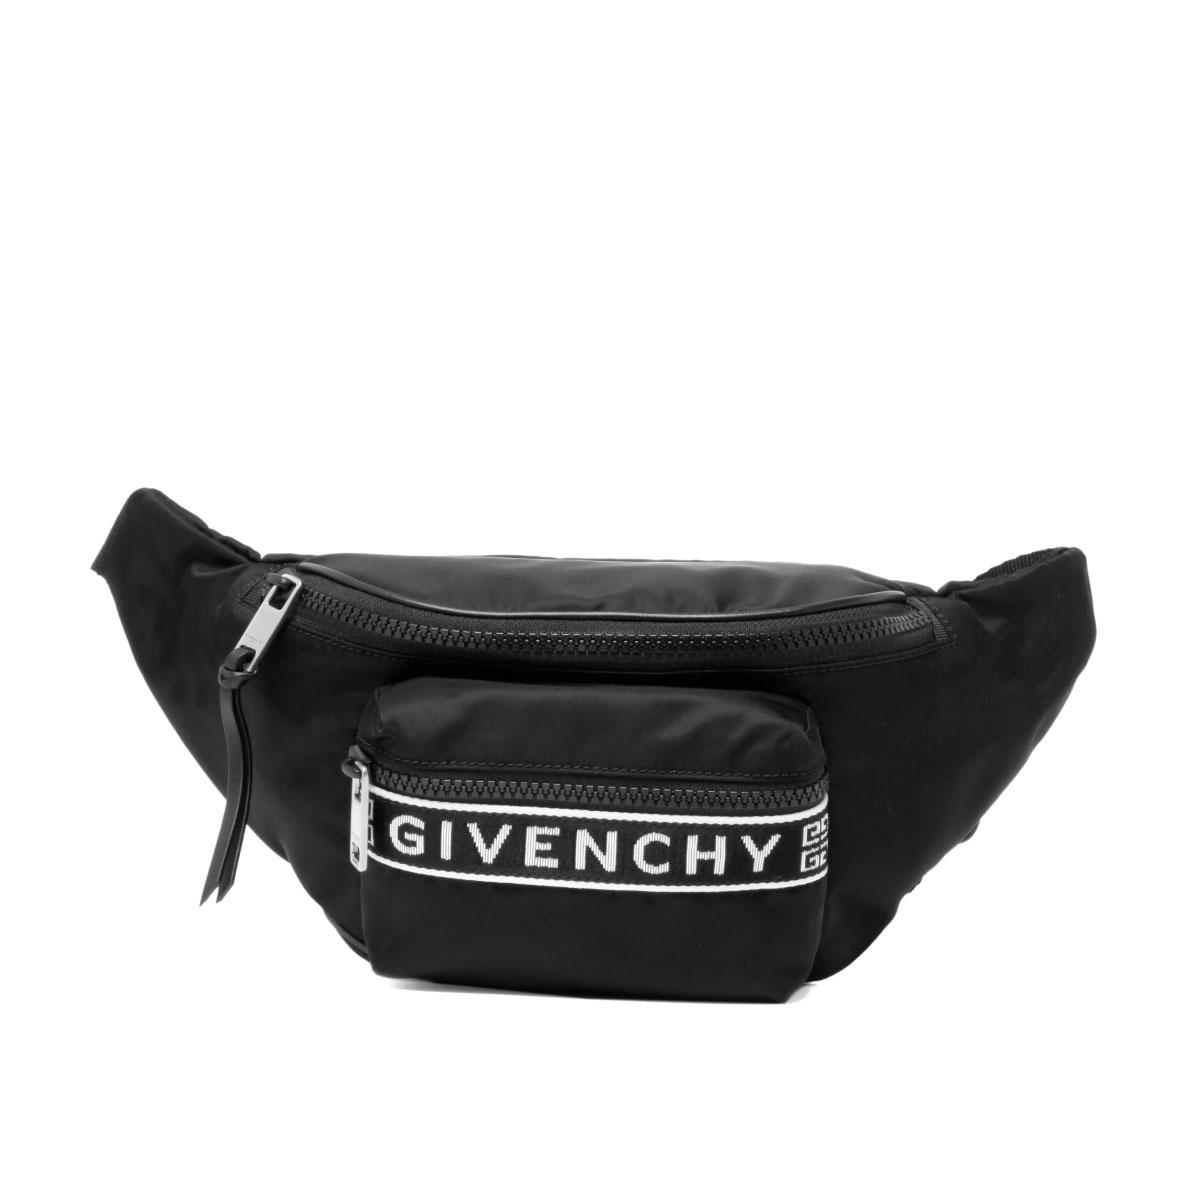 GIVENCHY ジバンシー | ウエストバッグ